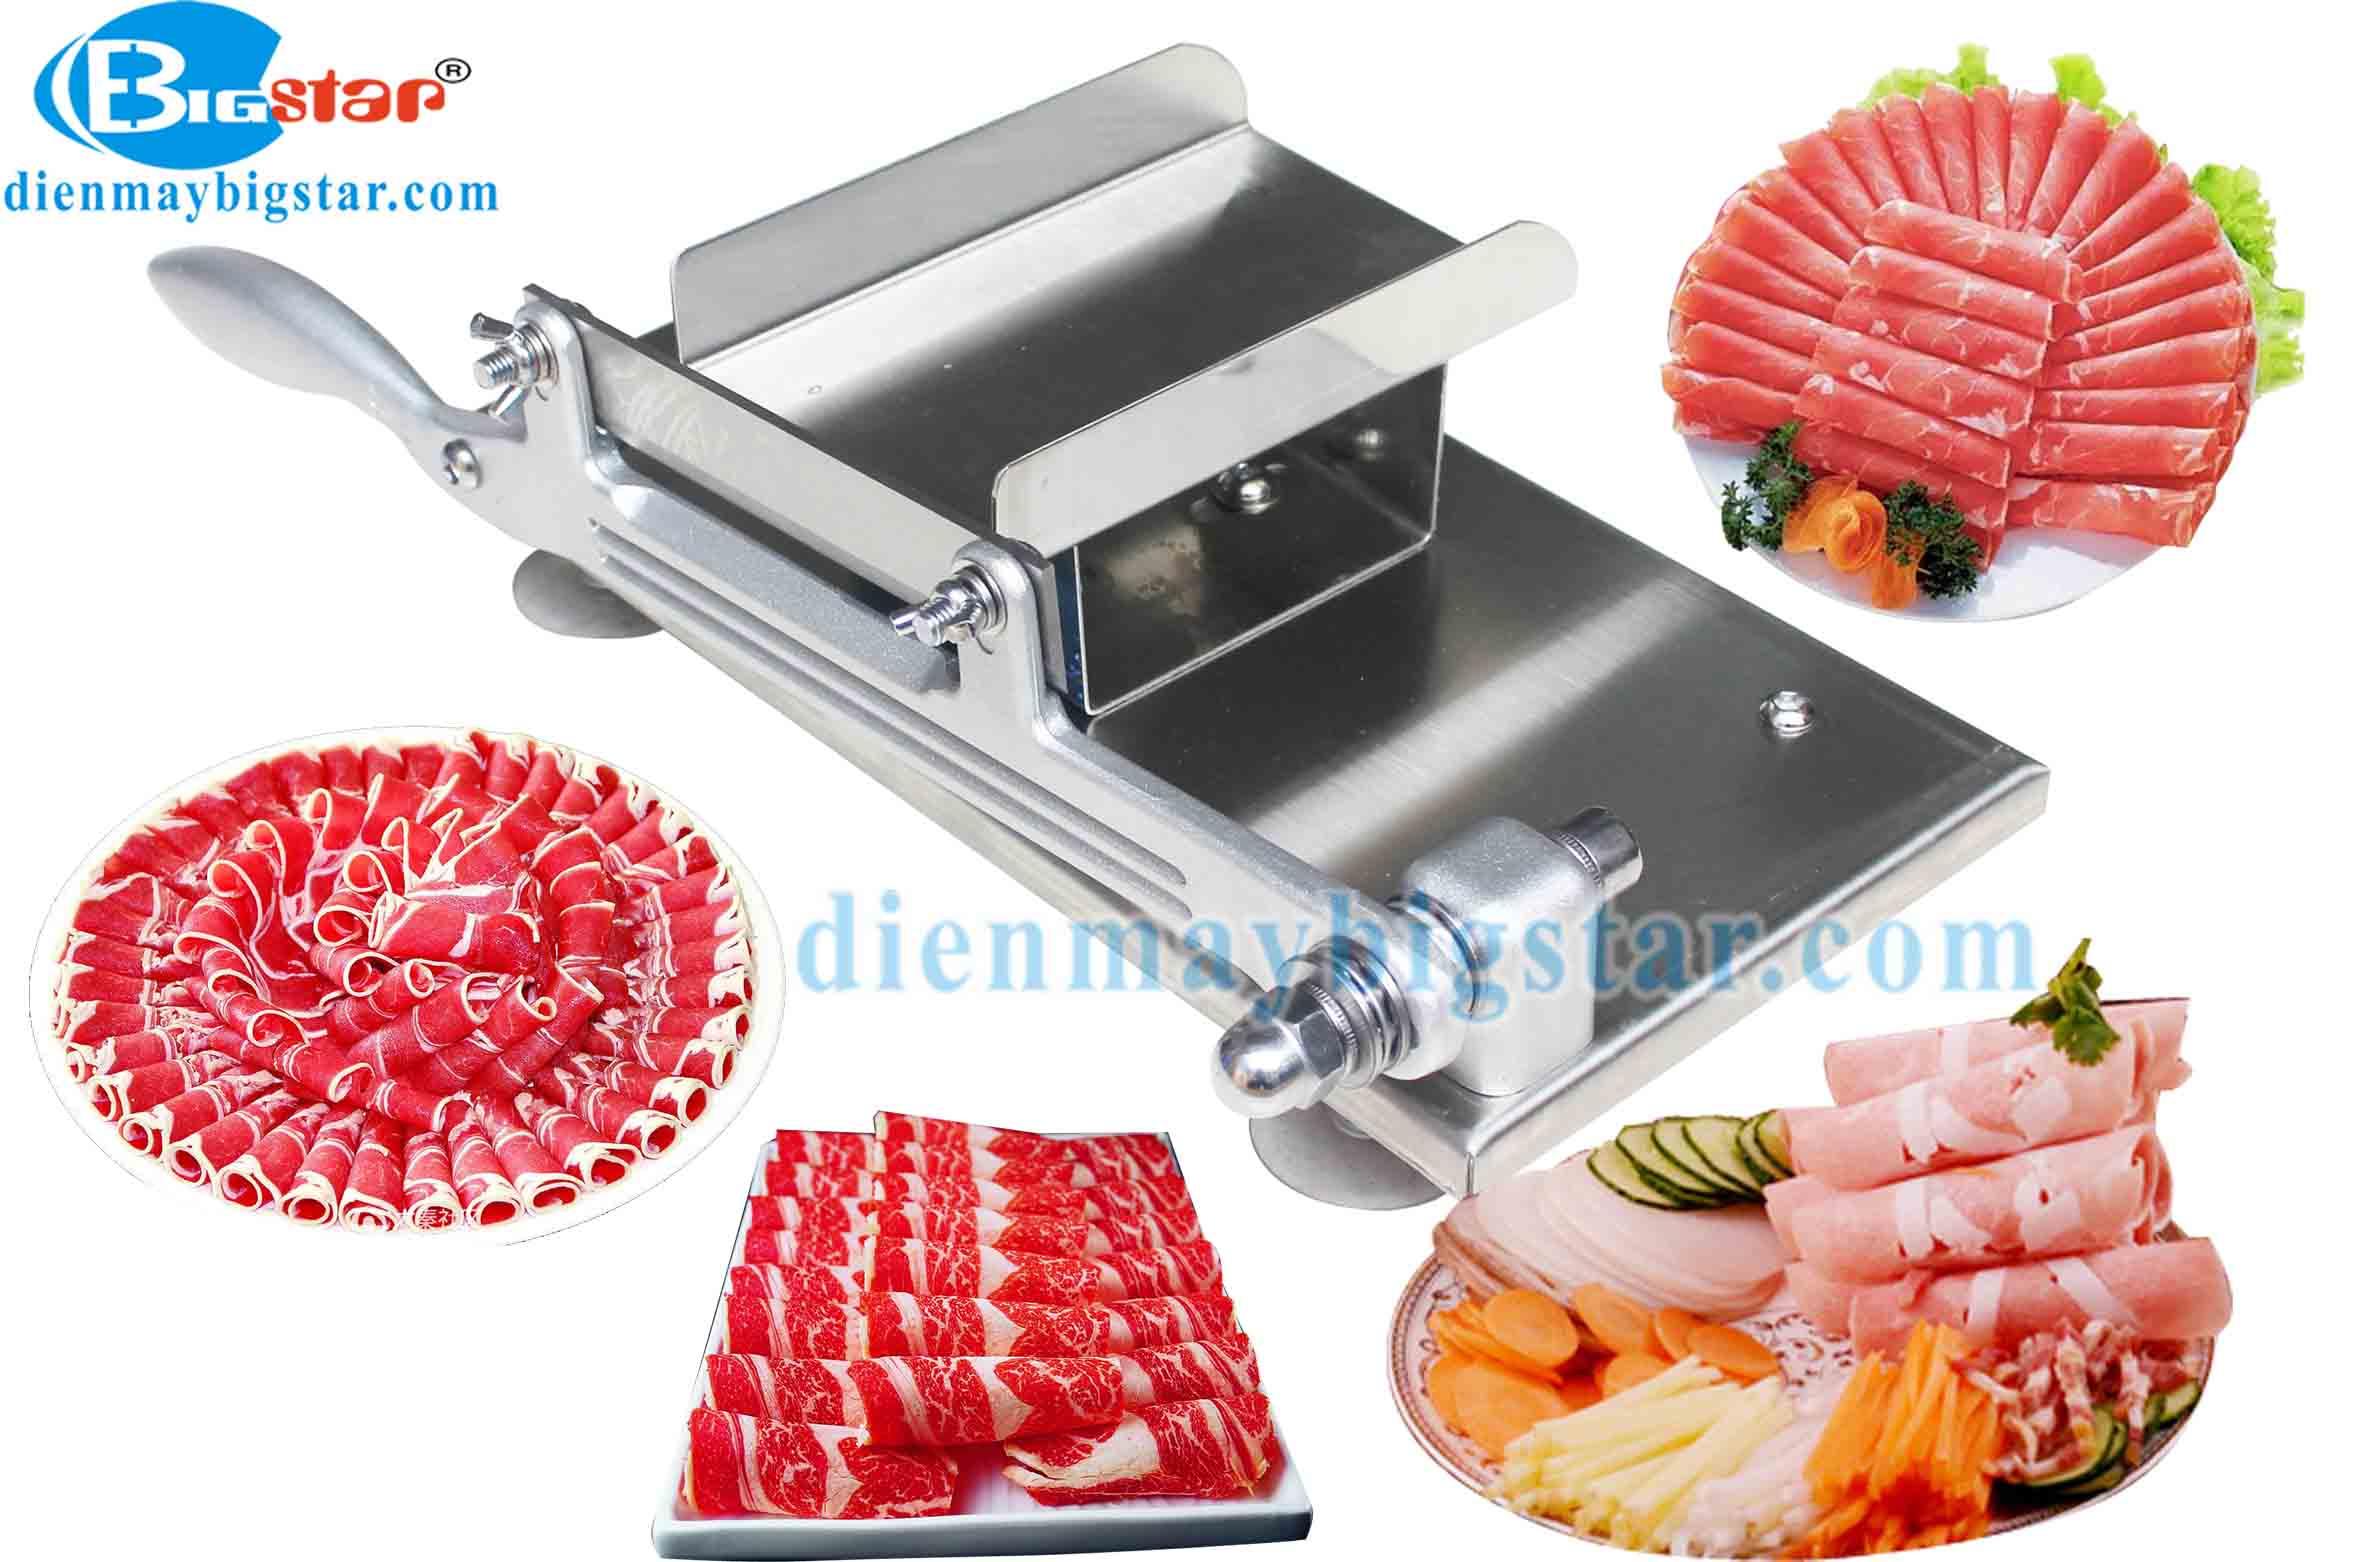 máy cắt thịt chín bigstar